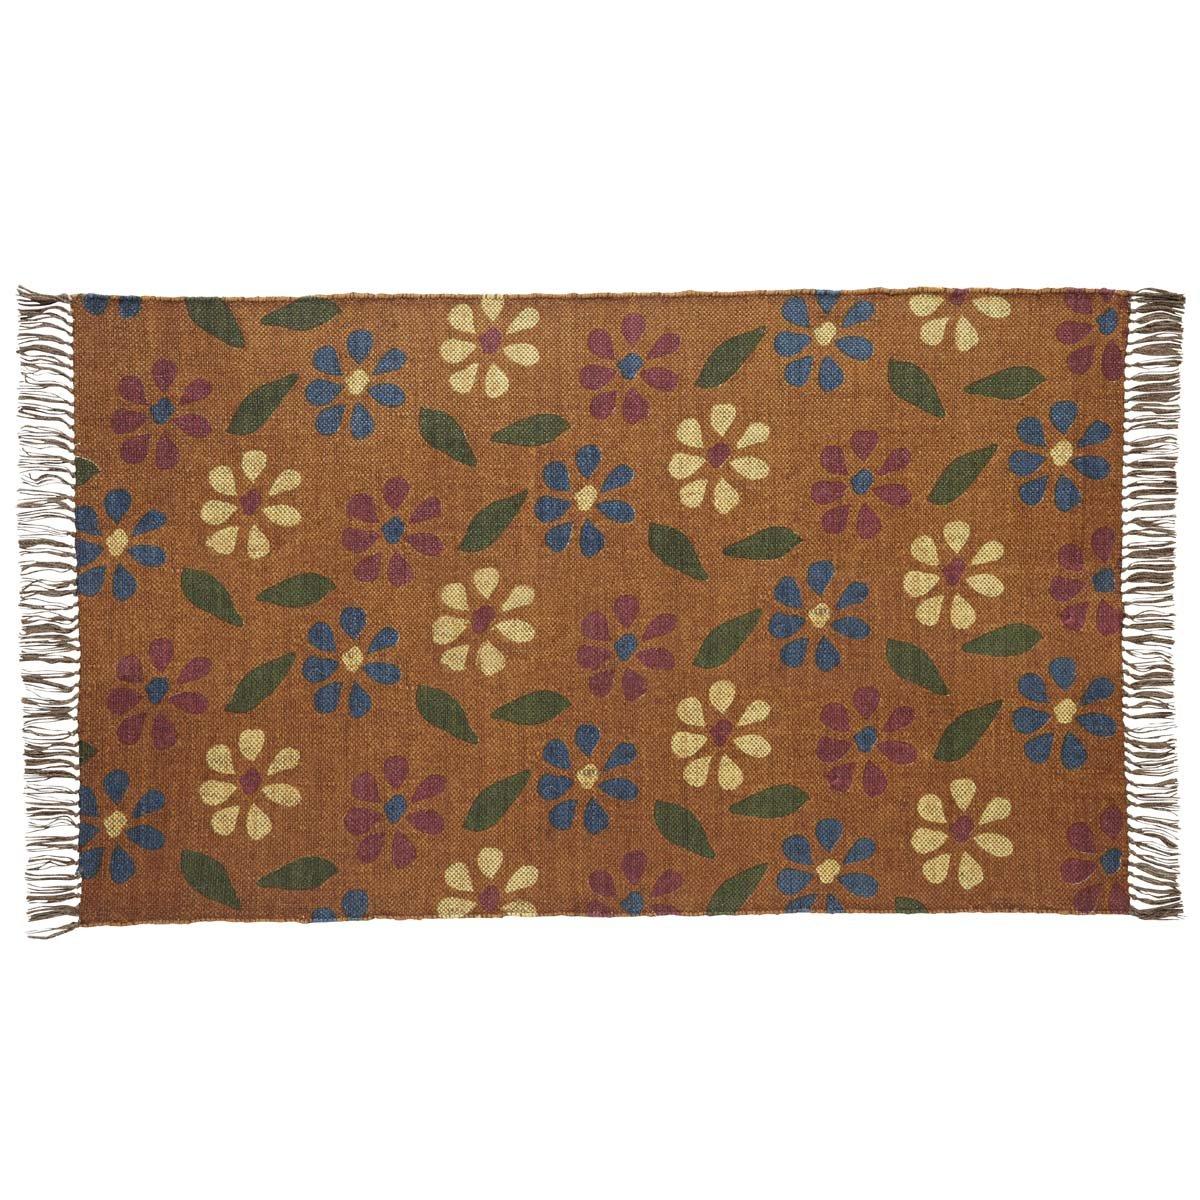 VHC Brands Seasonal Farmhouse Flooring Somerville Orange Printed Angle Kilim Rug 3 x 5